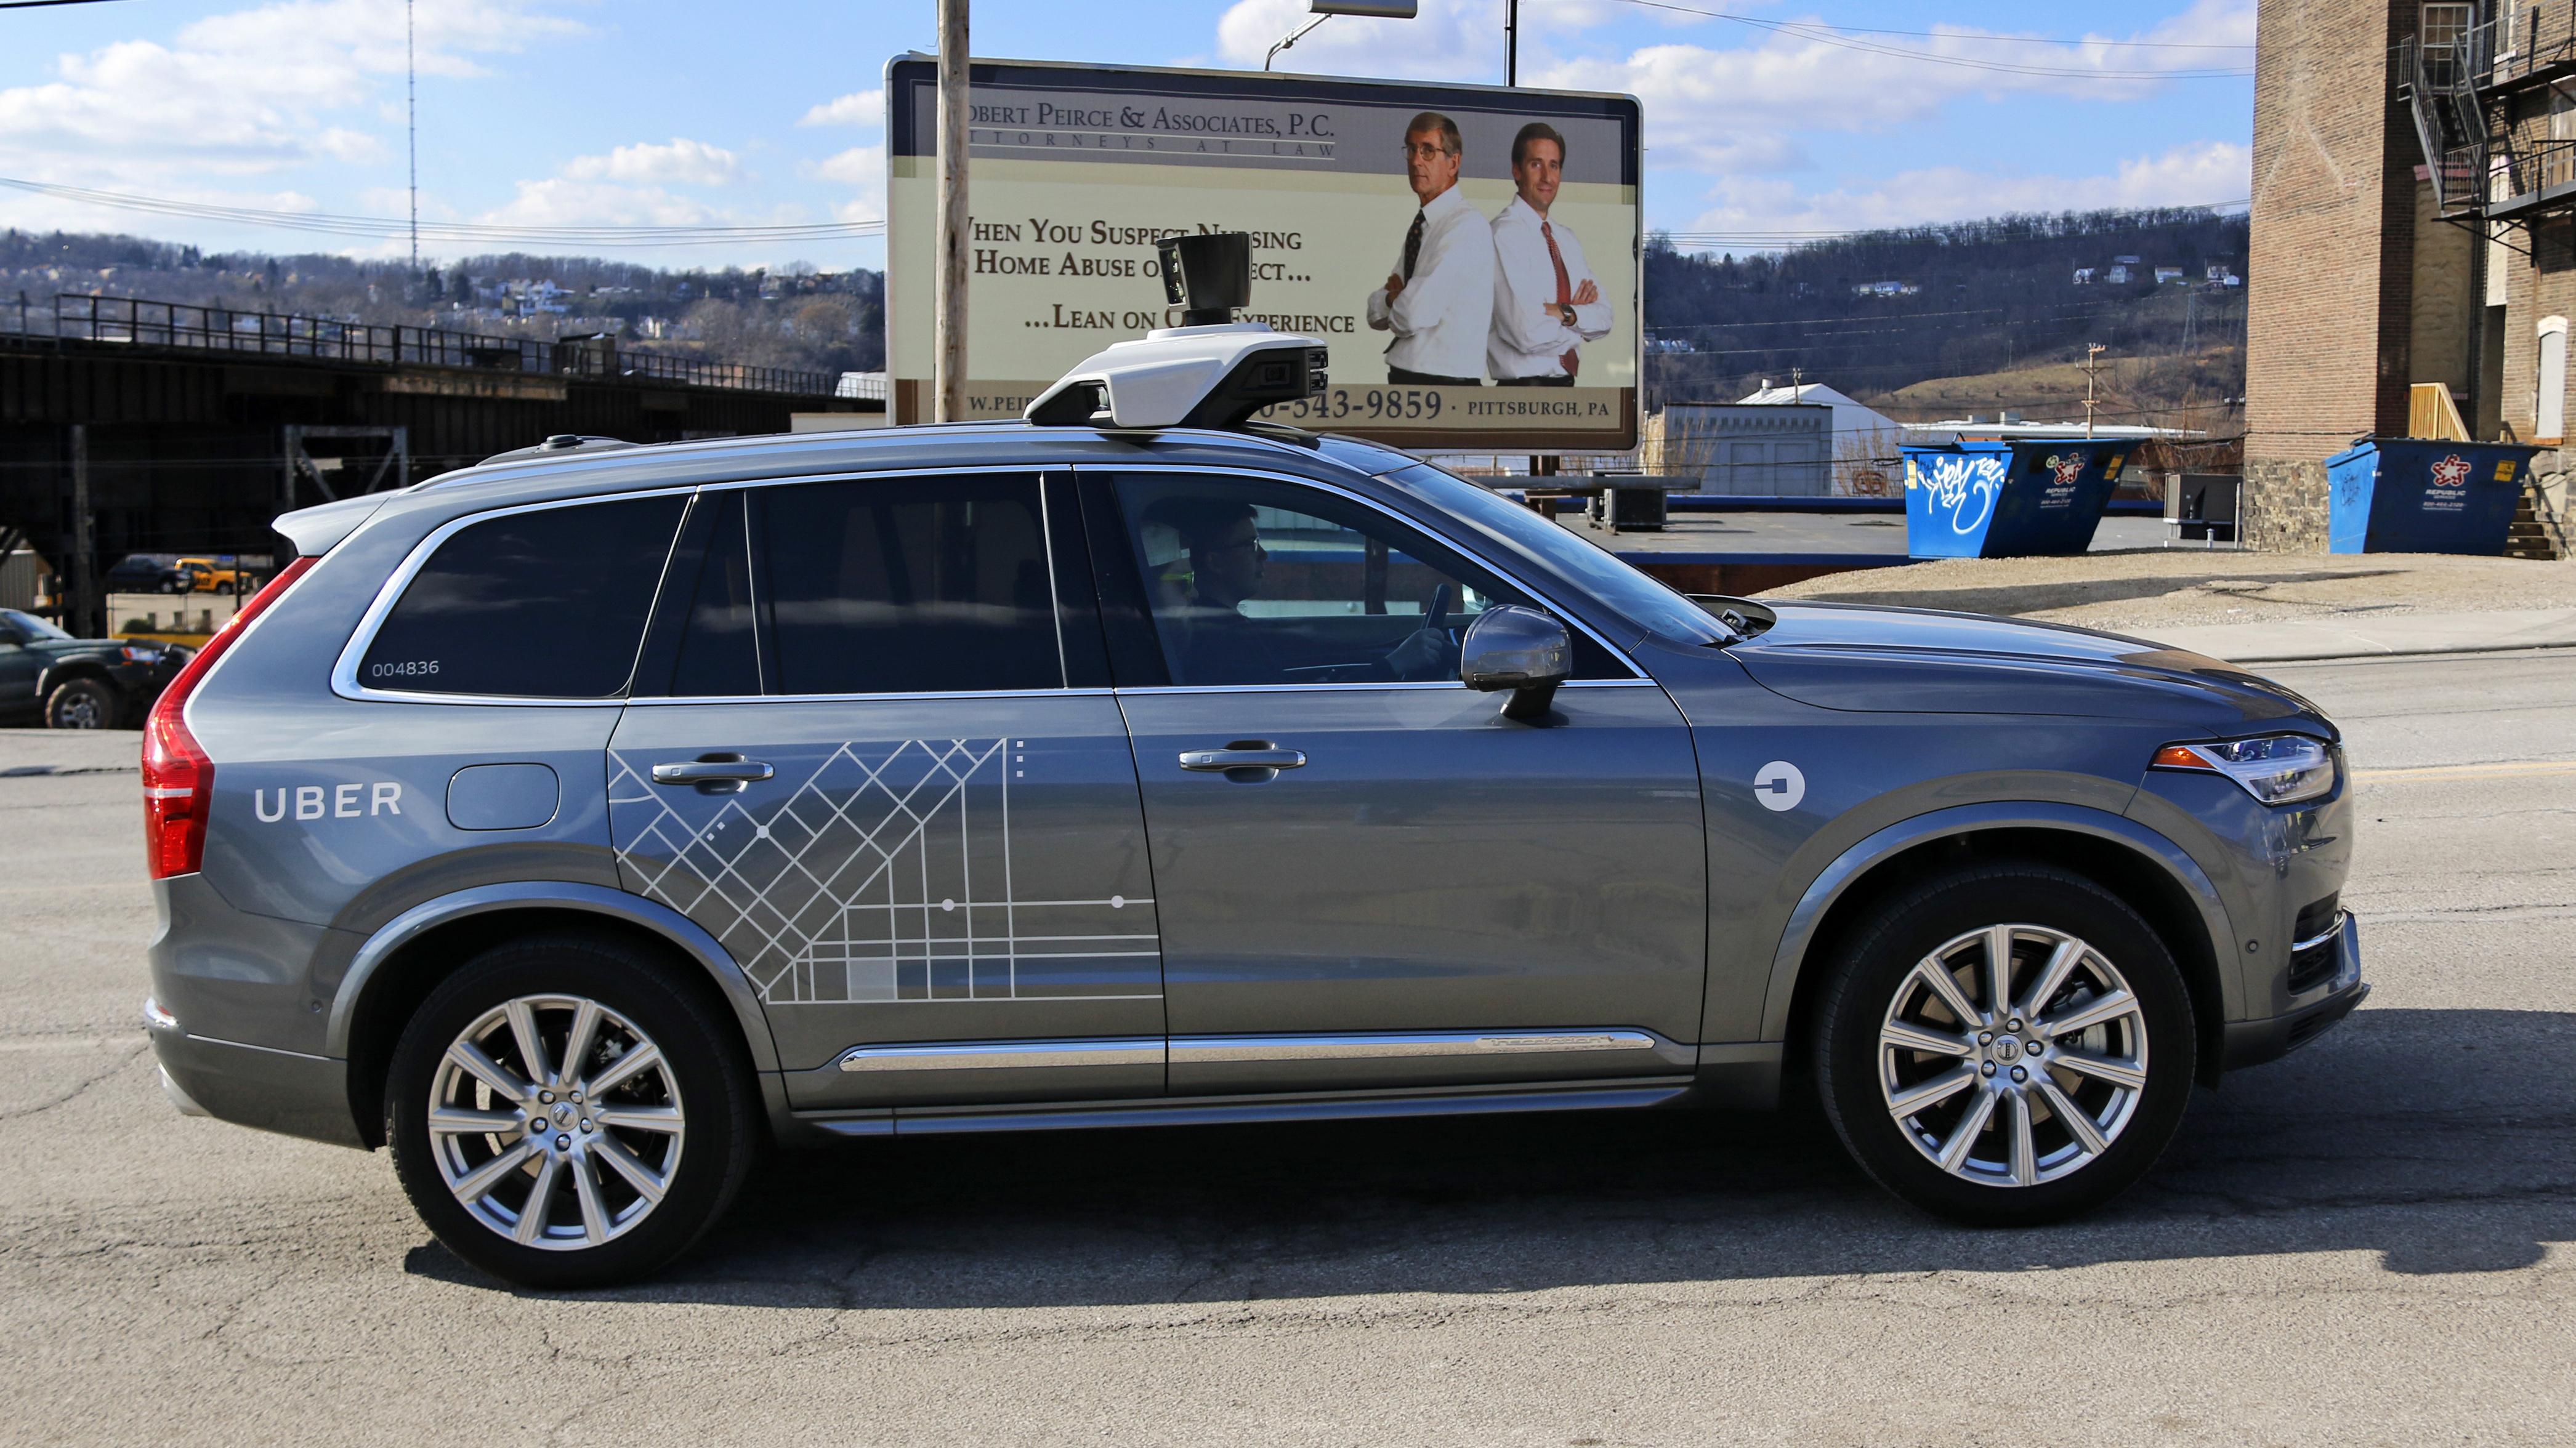 An Uber self-driving Volvo drives in Pittsburgh Friday, March 17, 2017. (AP Photo/Gene J. Puskar)